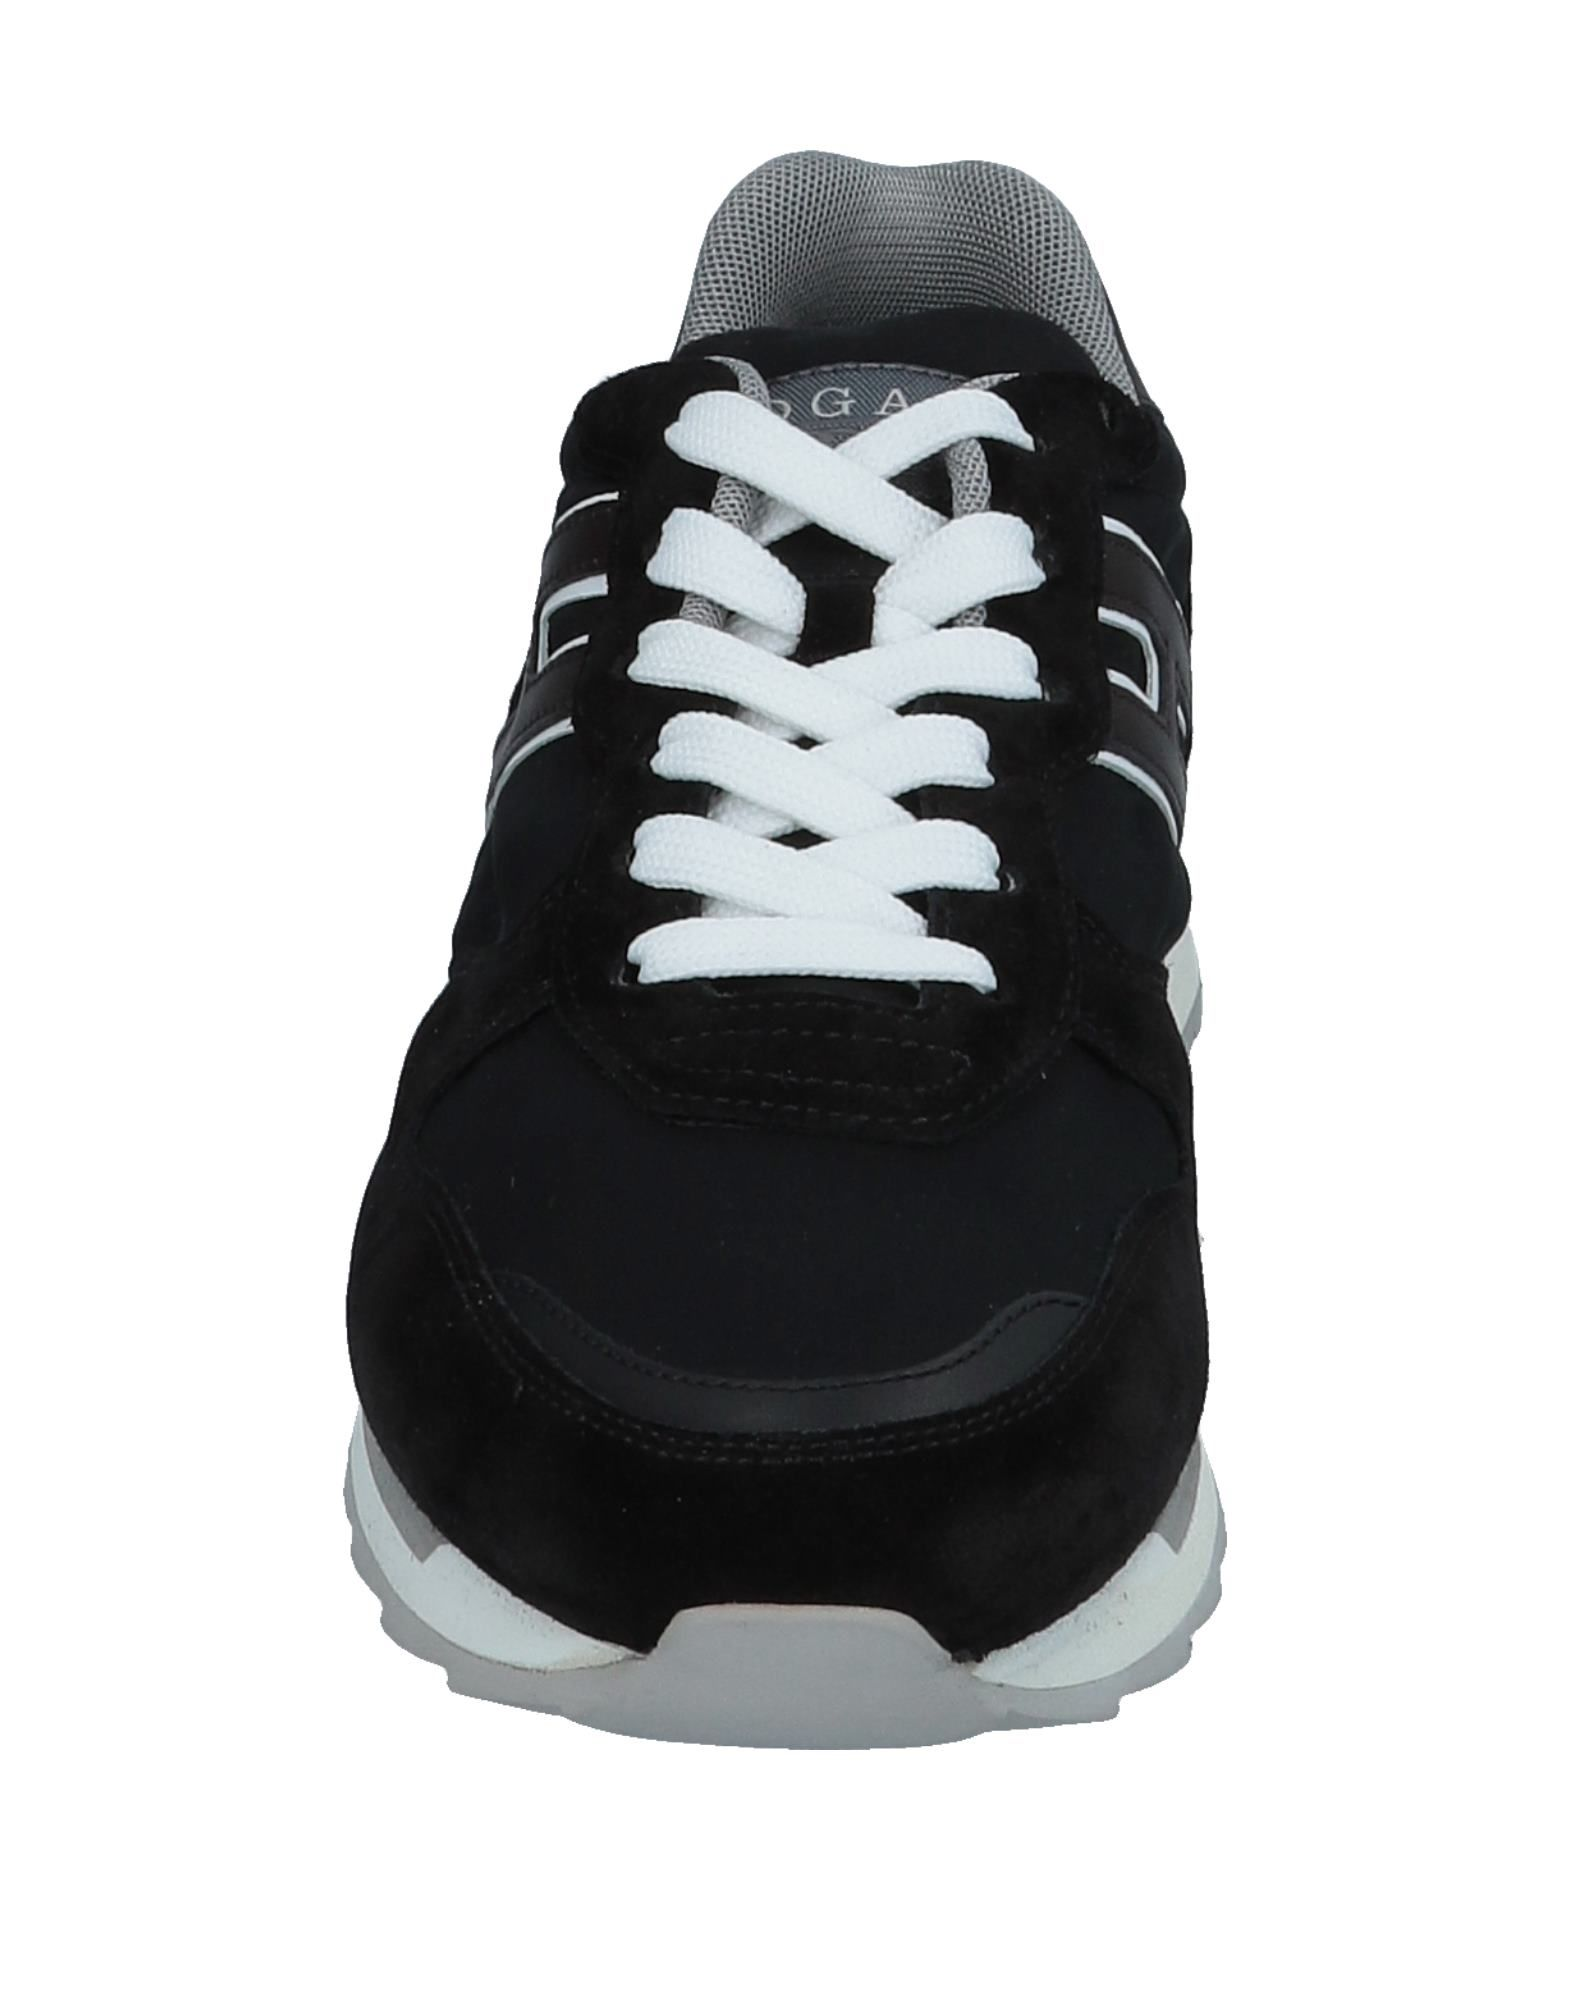 Hogan Rebel Sneakers Herren Herren Sneakers  11298170QH ff7cae